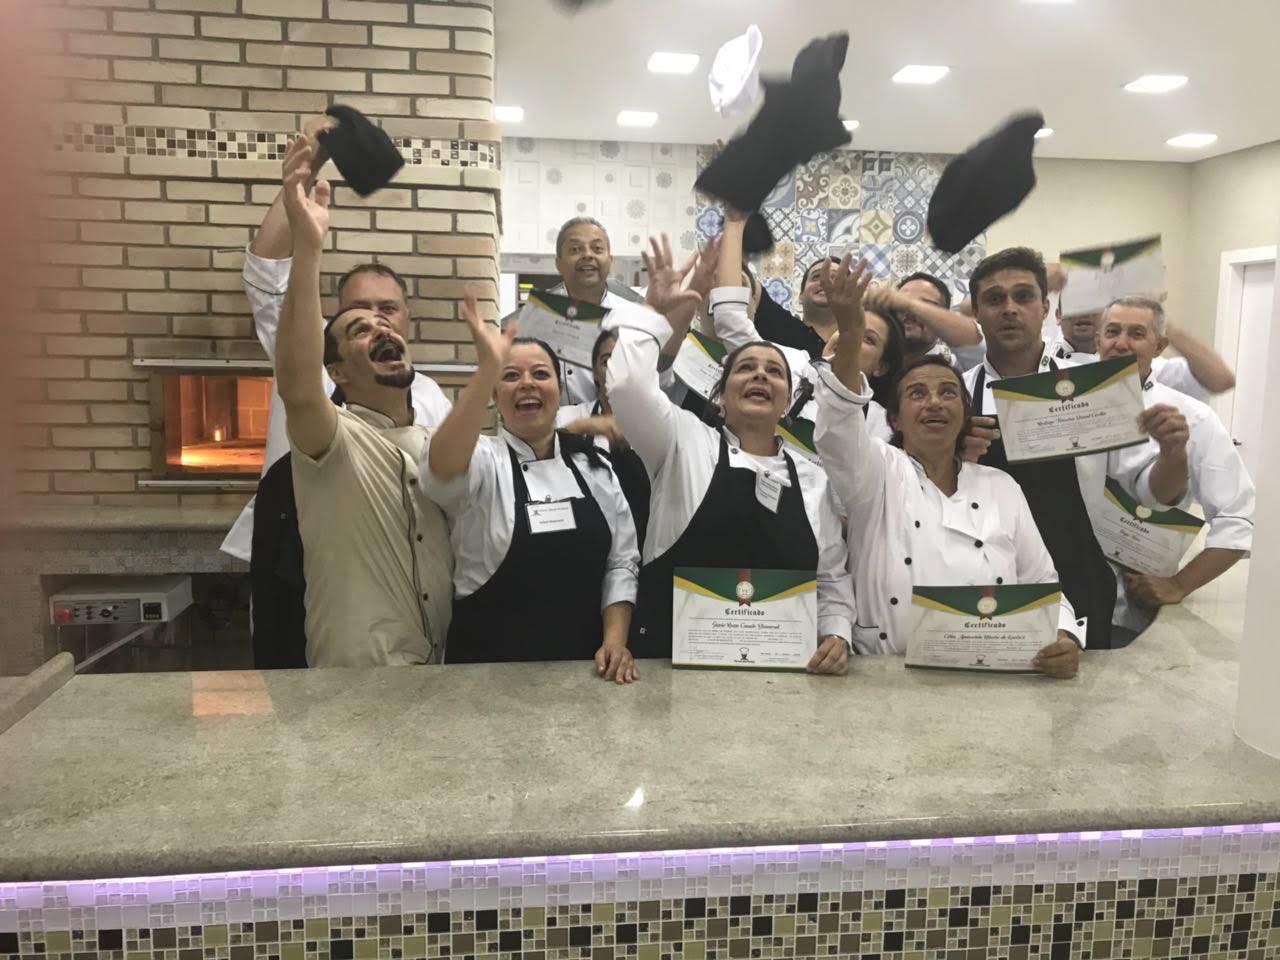 CURSO PROFISSIONAL PRESENCIAL PARA DONOS DE PIZZARIAS E PIZZAIOLLOS ANO  2018/2019  - Fórum de Pizzas Vendas online